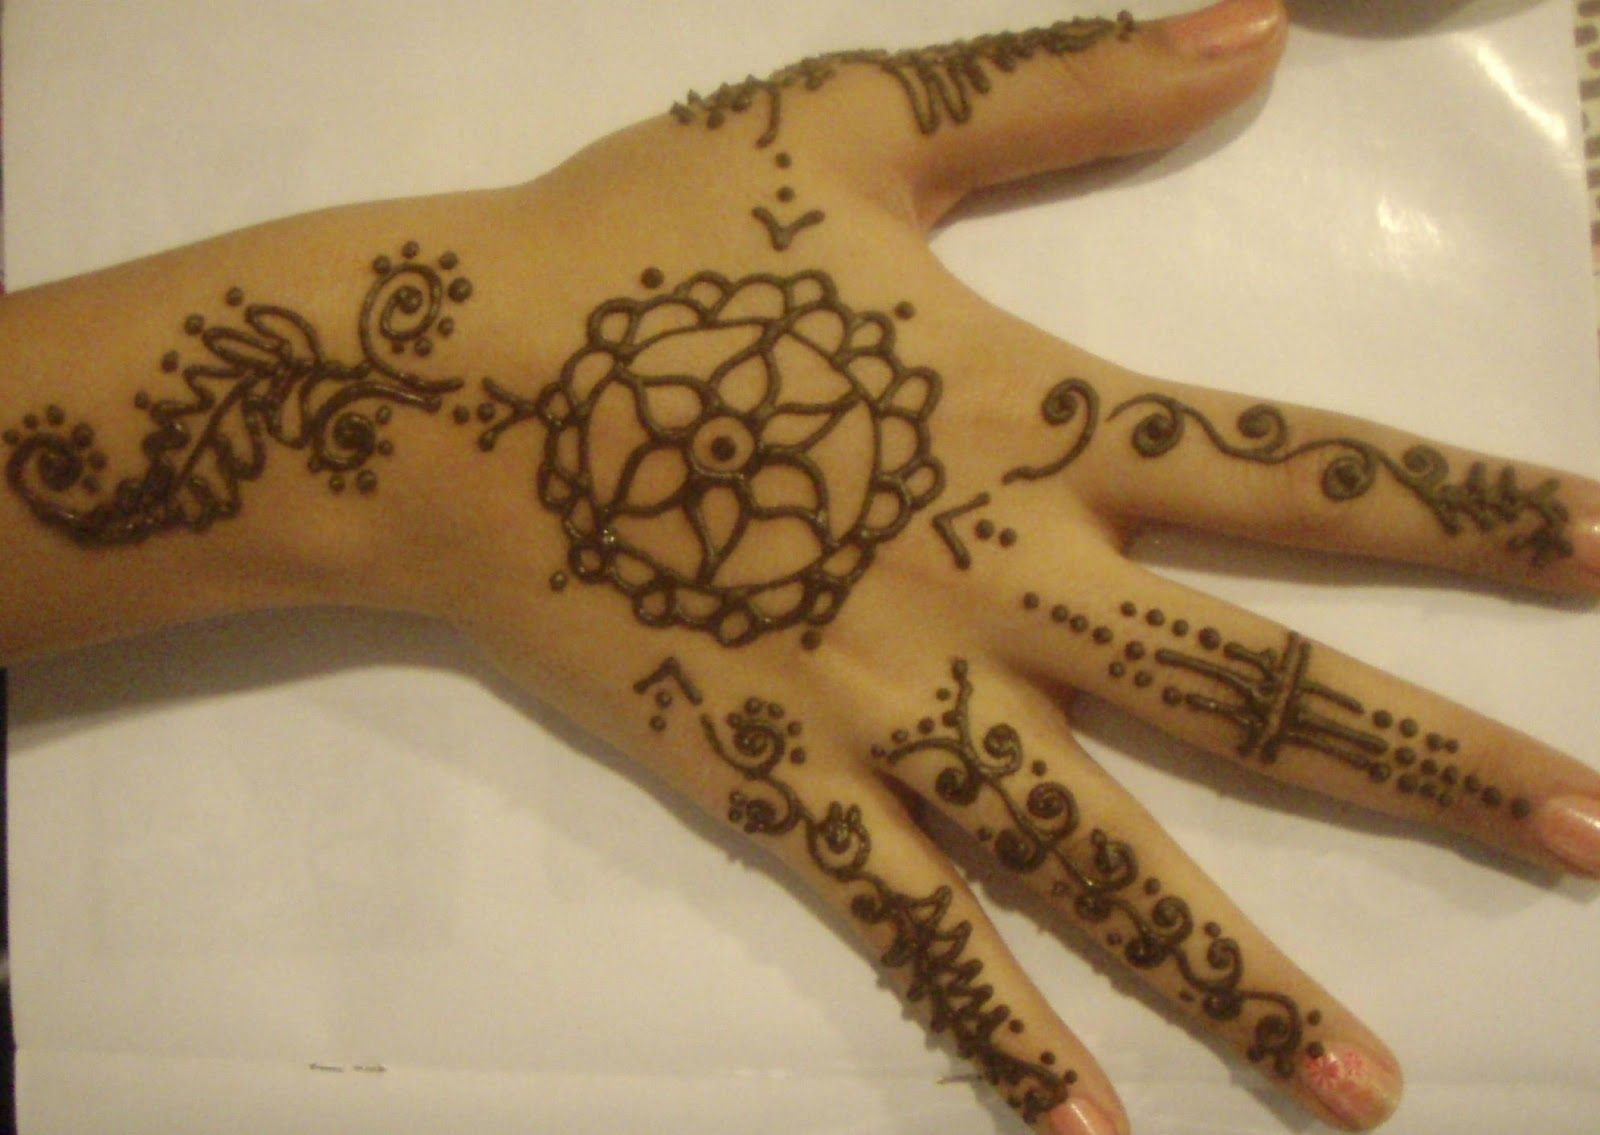 Mehndi Party Things To Do : Inai henna tattoo mehendi for raya parties activities at malls